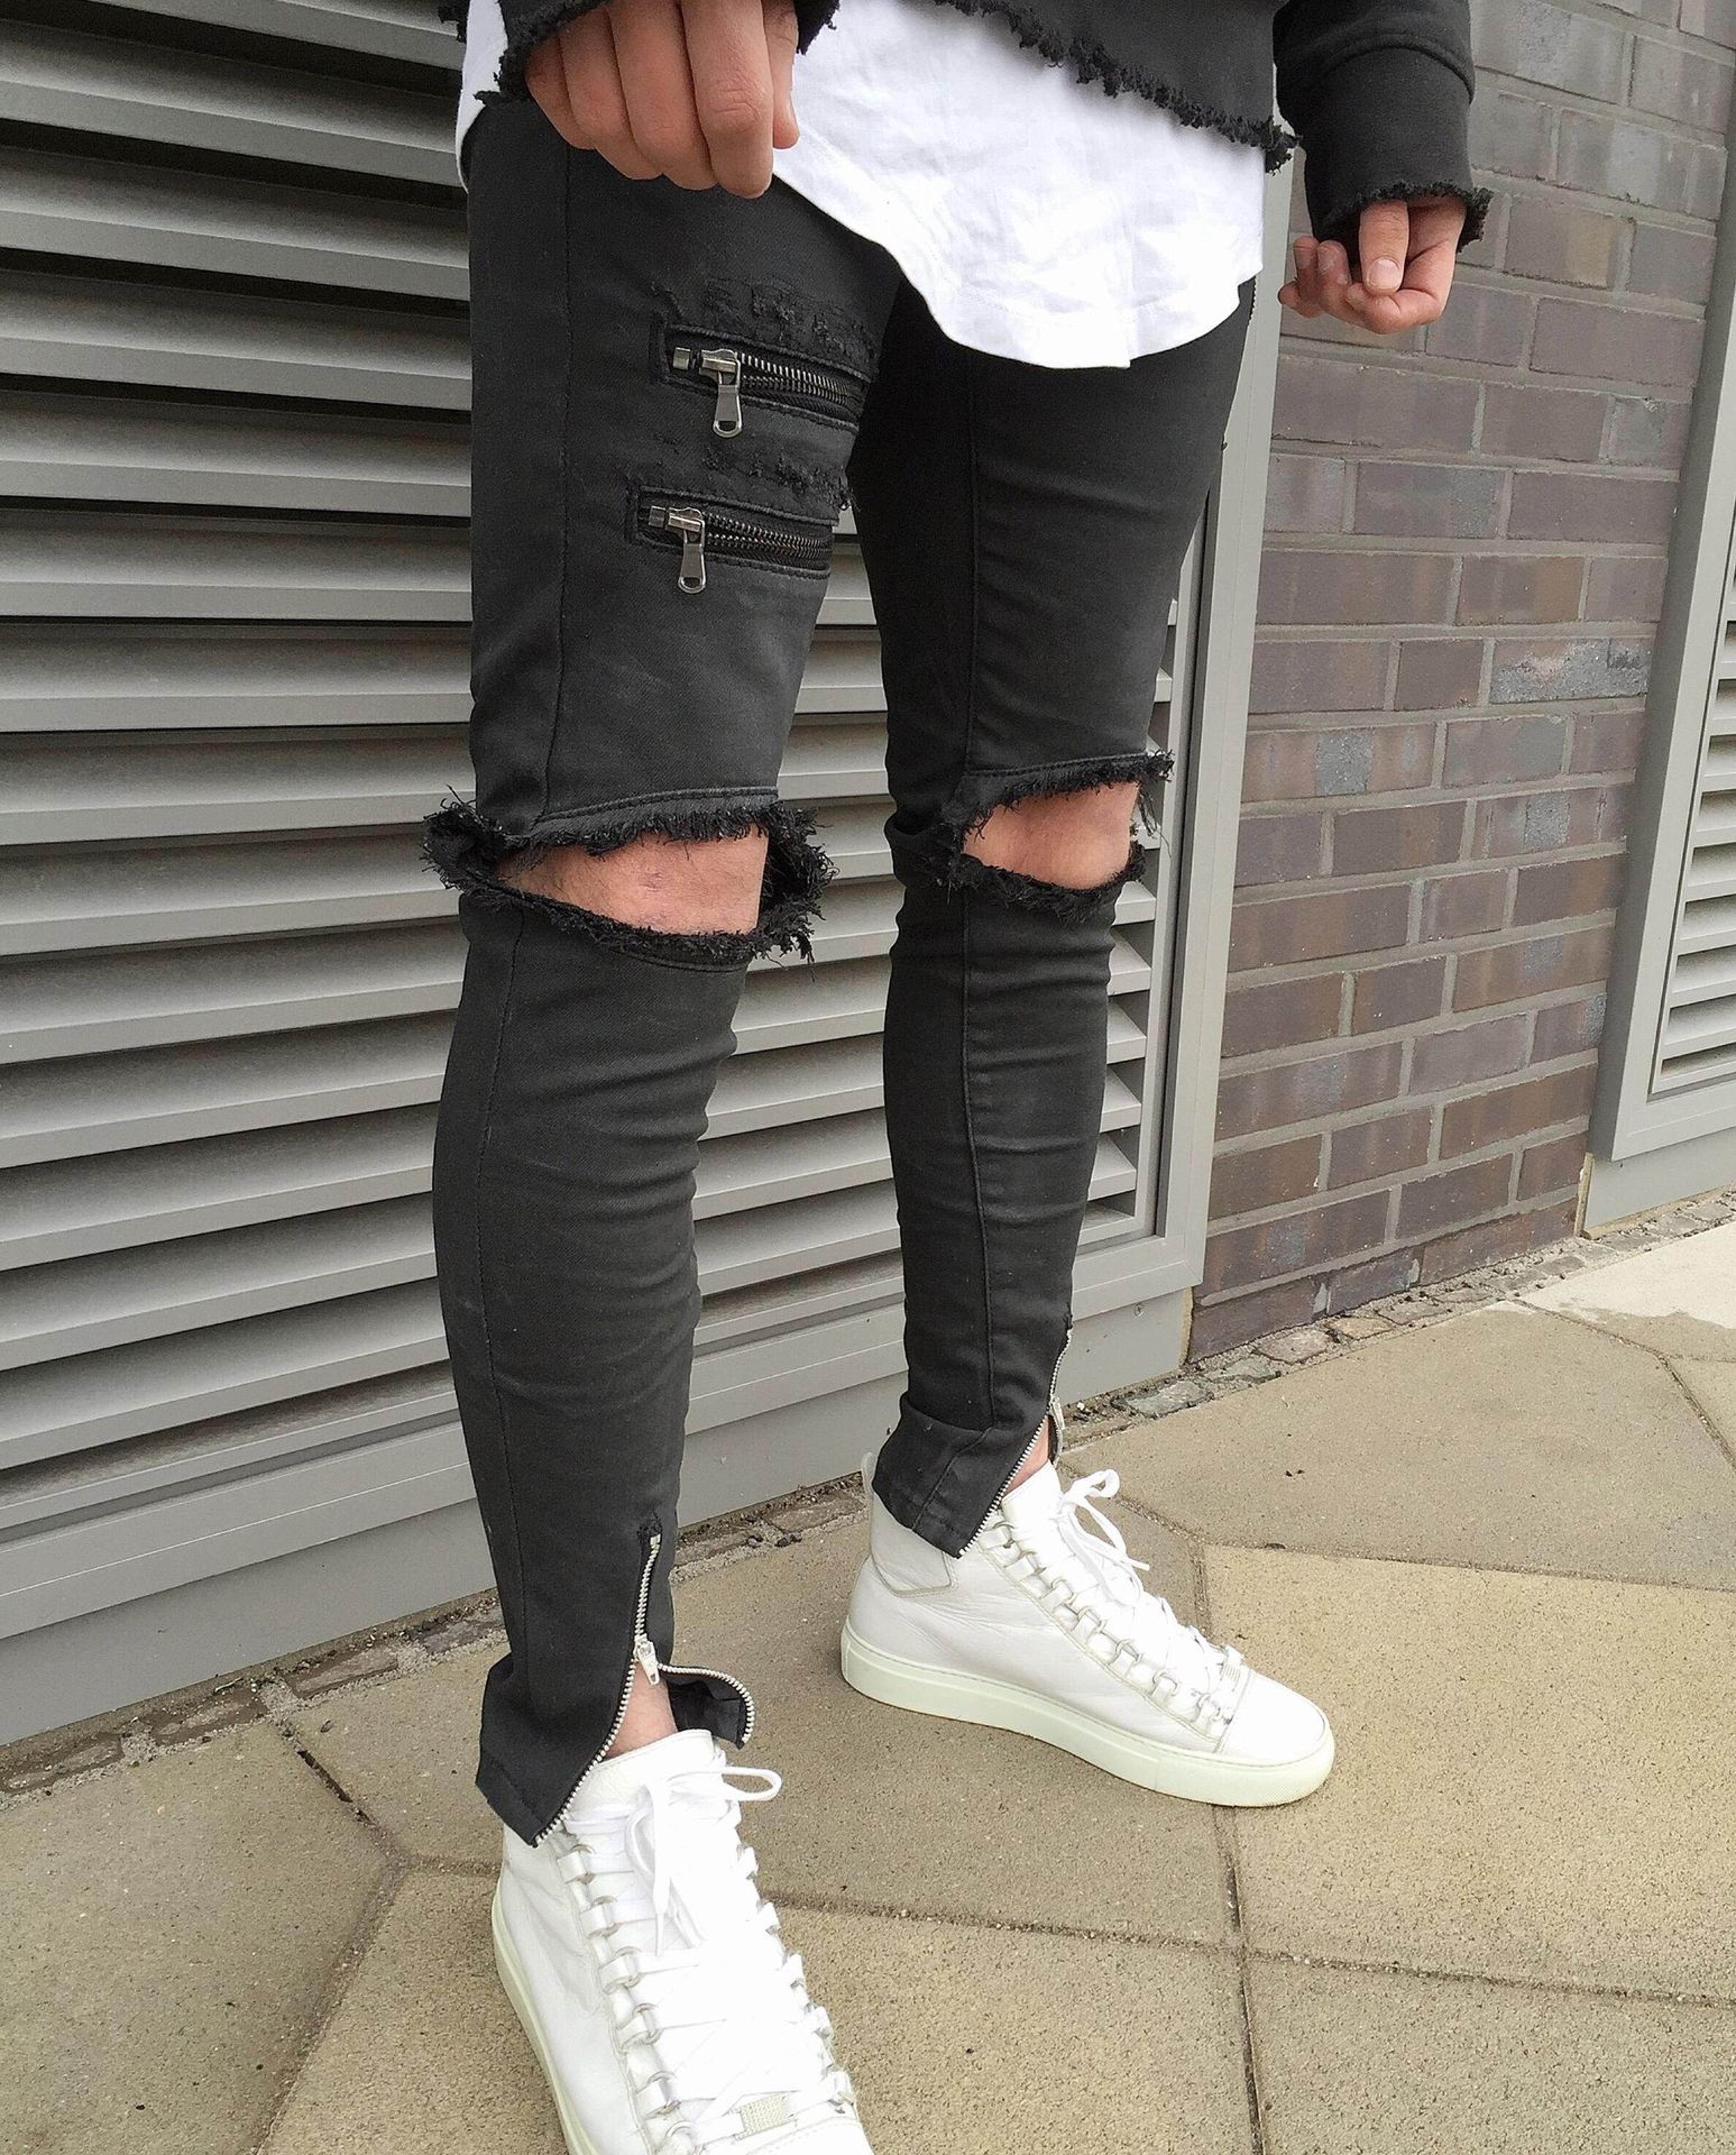 TOP men's designer man pants brand slp zipper justin bieber rockstar black distressed ripped skinny fear of god jeans